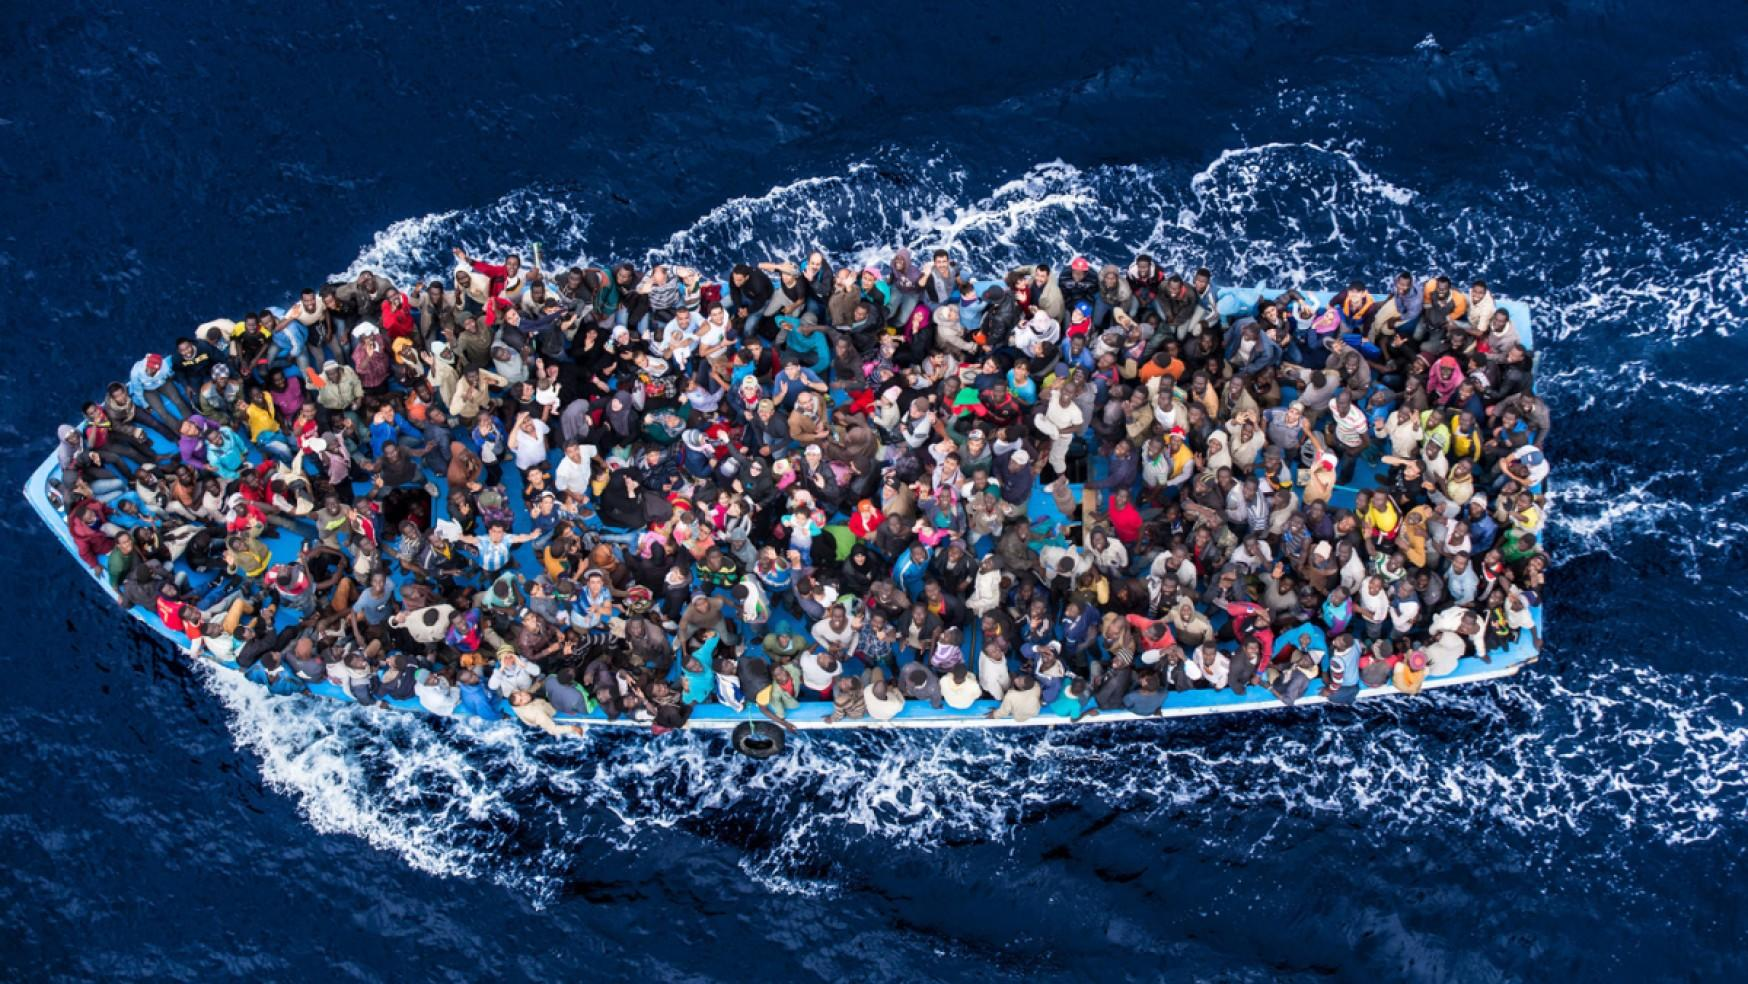 Migrants arrivant en europe